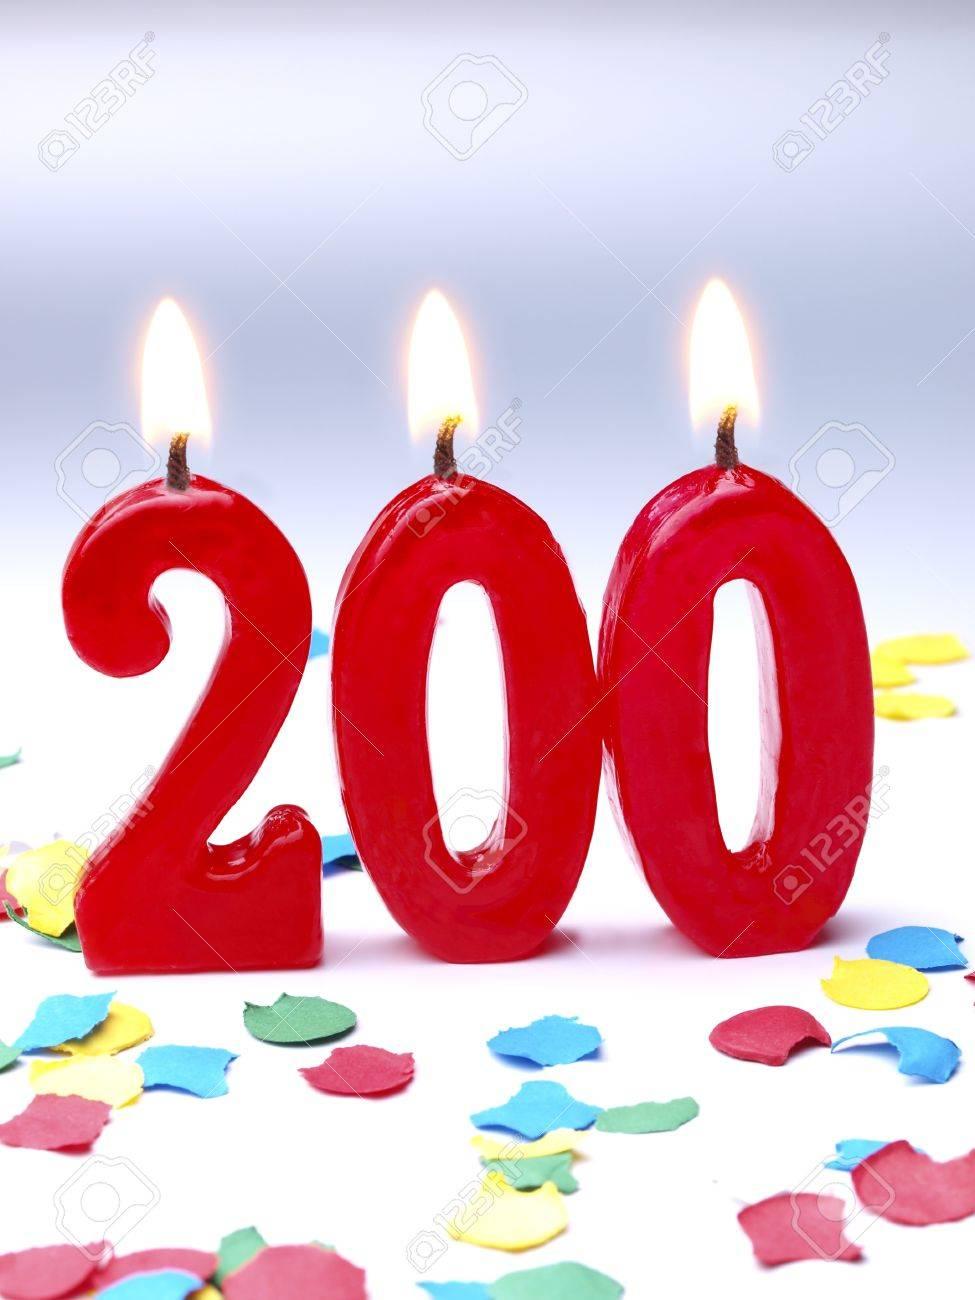 15551030-birthday-candles-showing-nr-200.jpg